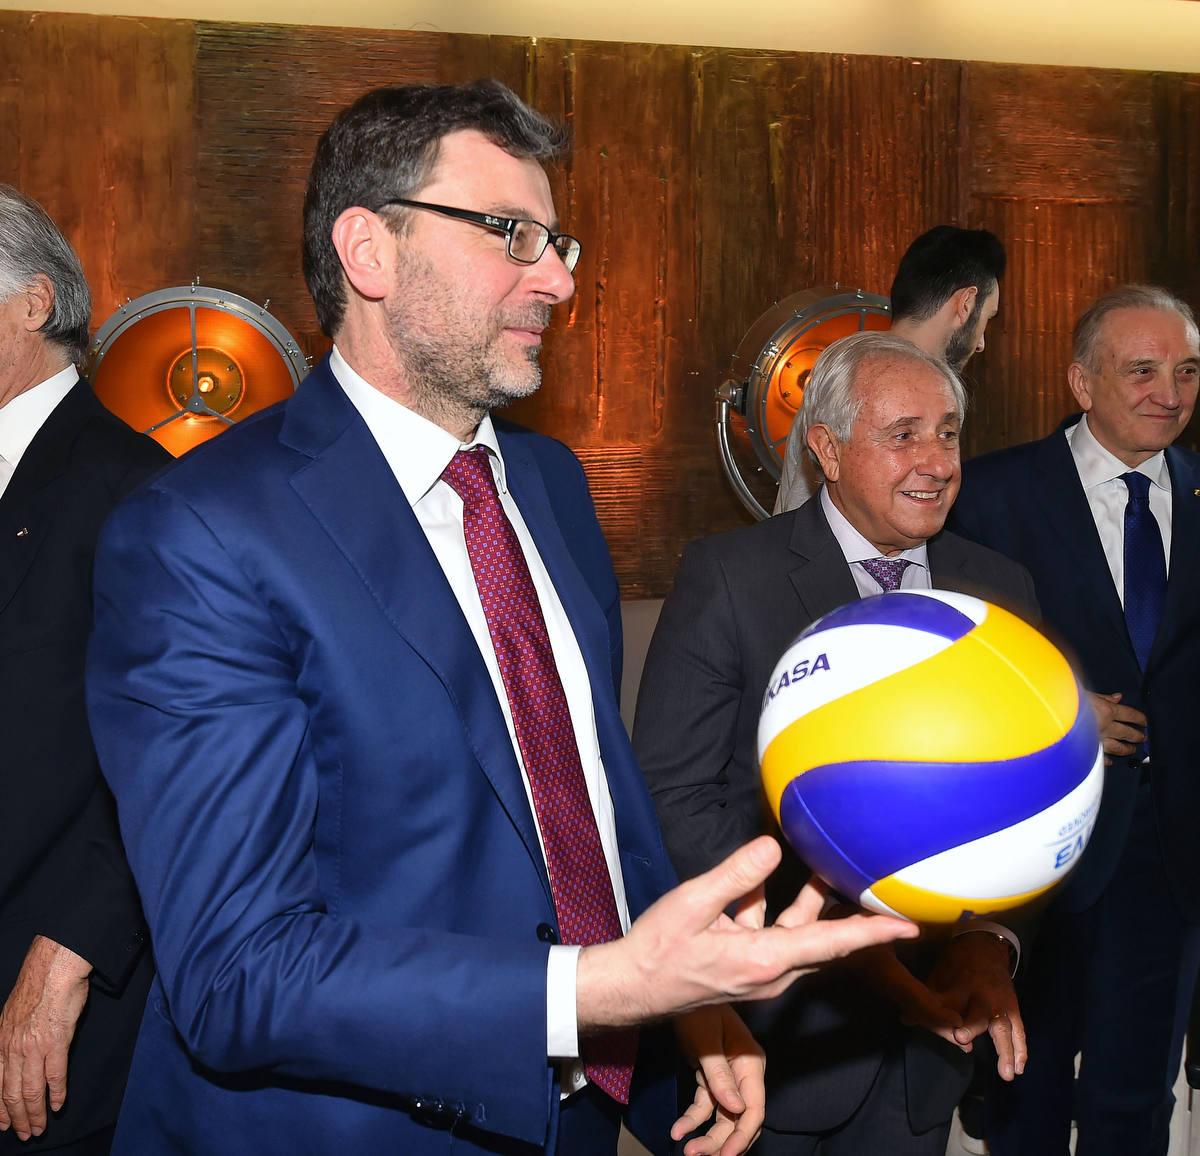 beach volley foto mezzelani gmt sport027